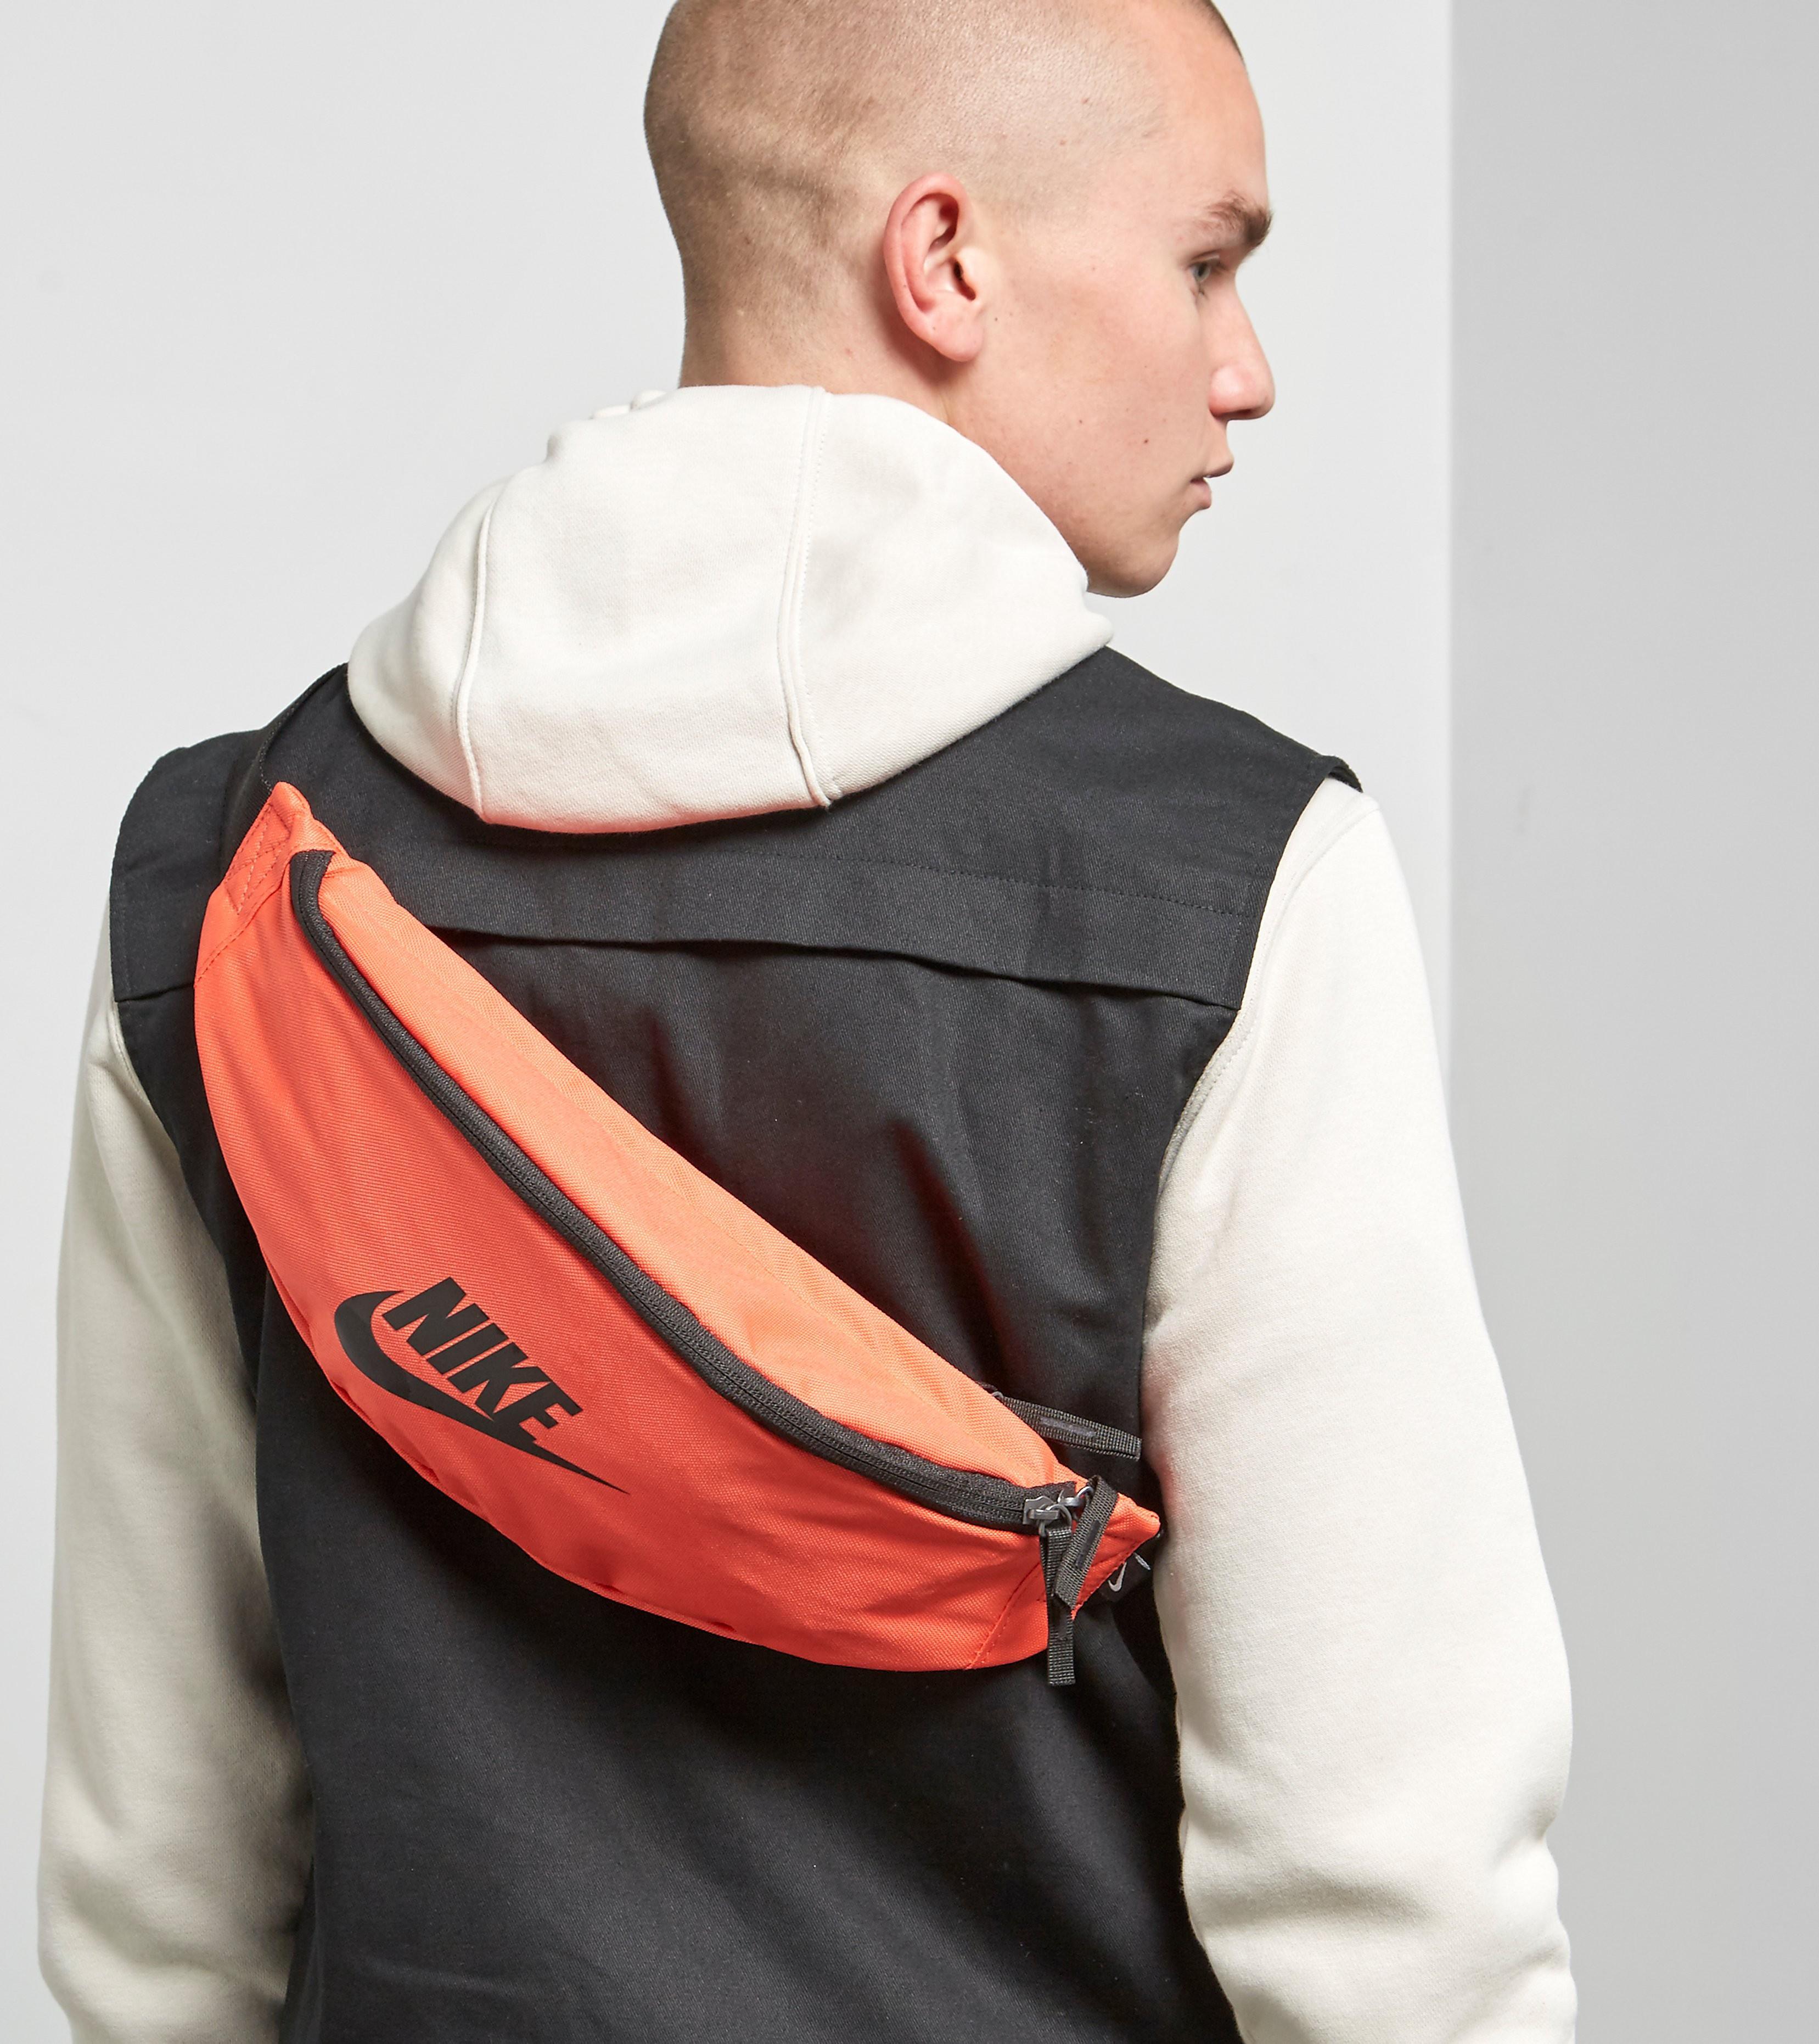 Nike Nike Fanny Pack, Oranje